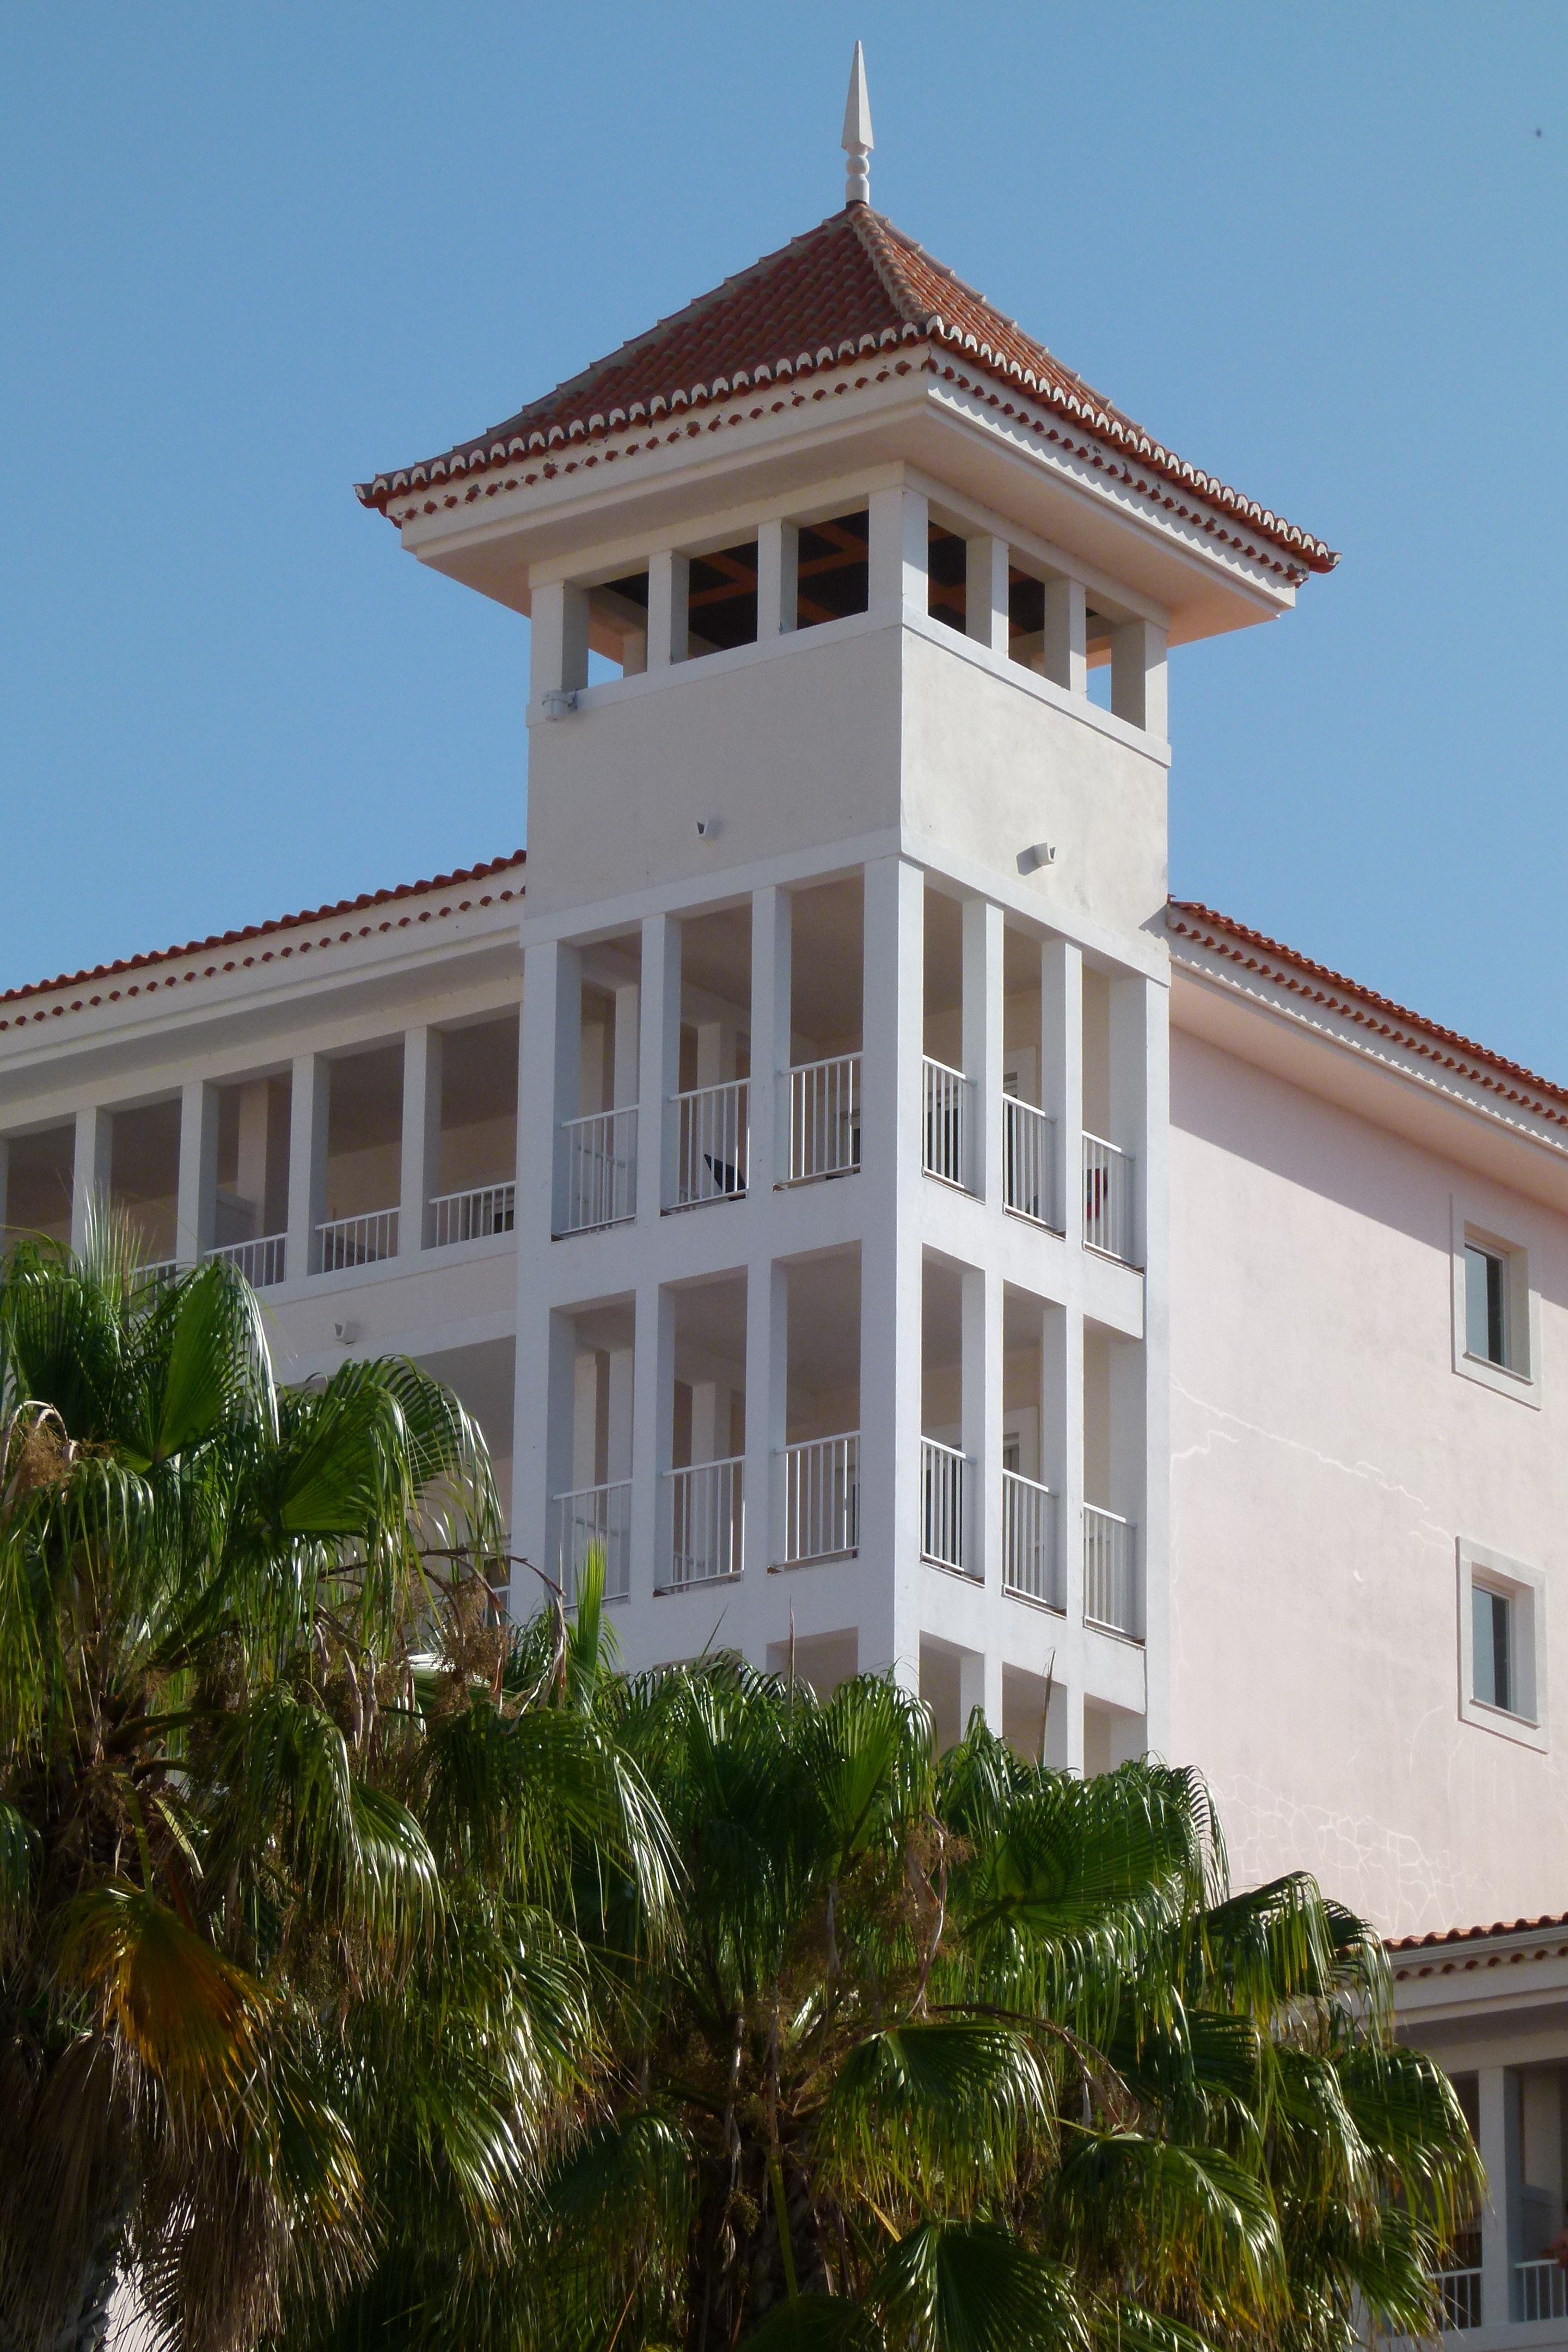 Hotel Istana Gambar Arsitektur Vila Rumah Besar Bangunan Istana Menara